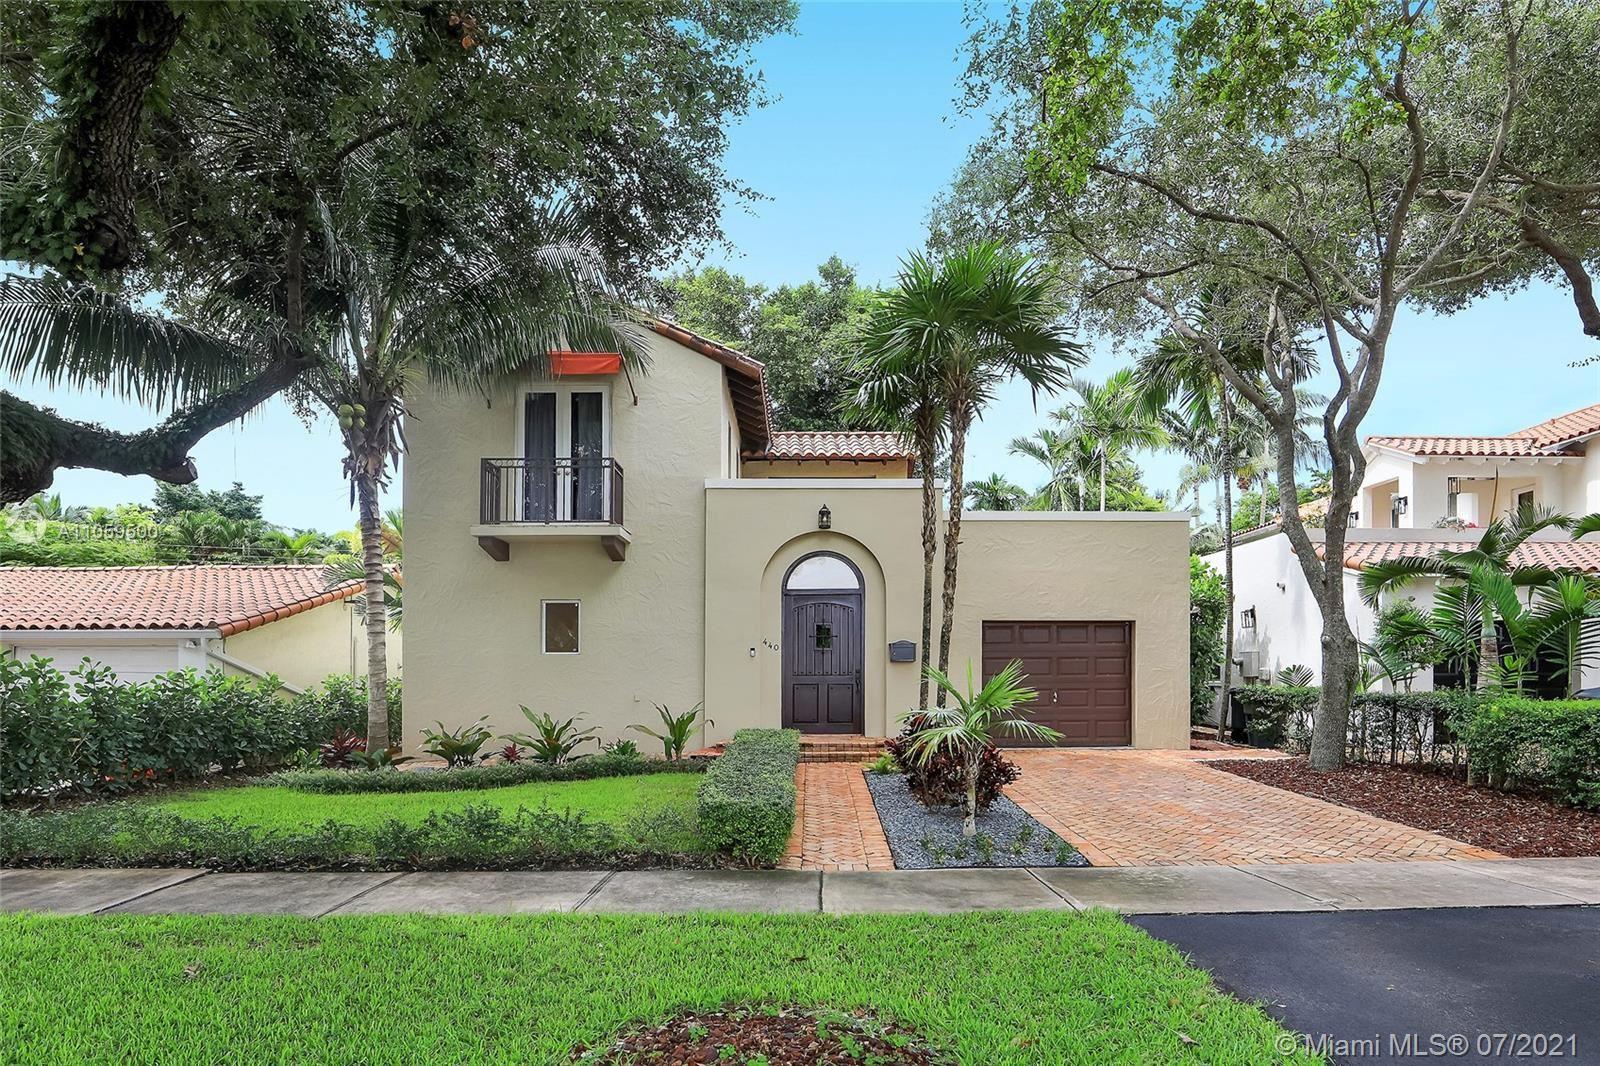 Photo of 440 Rosaro Avenue, Coral Gables, FL 33146 (MLS # A11059500)